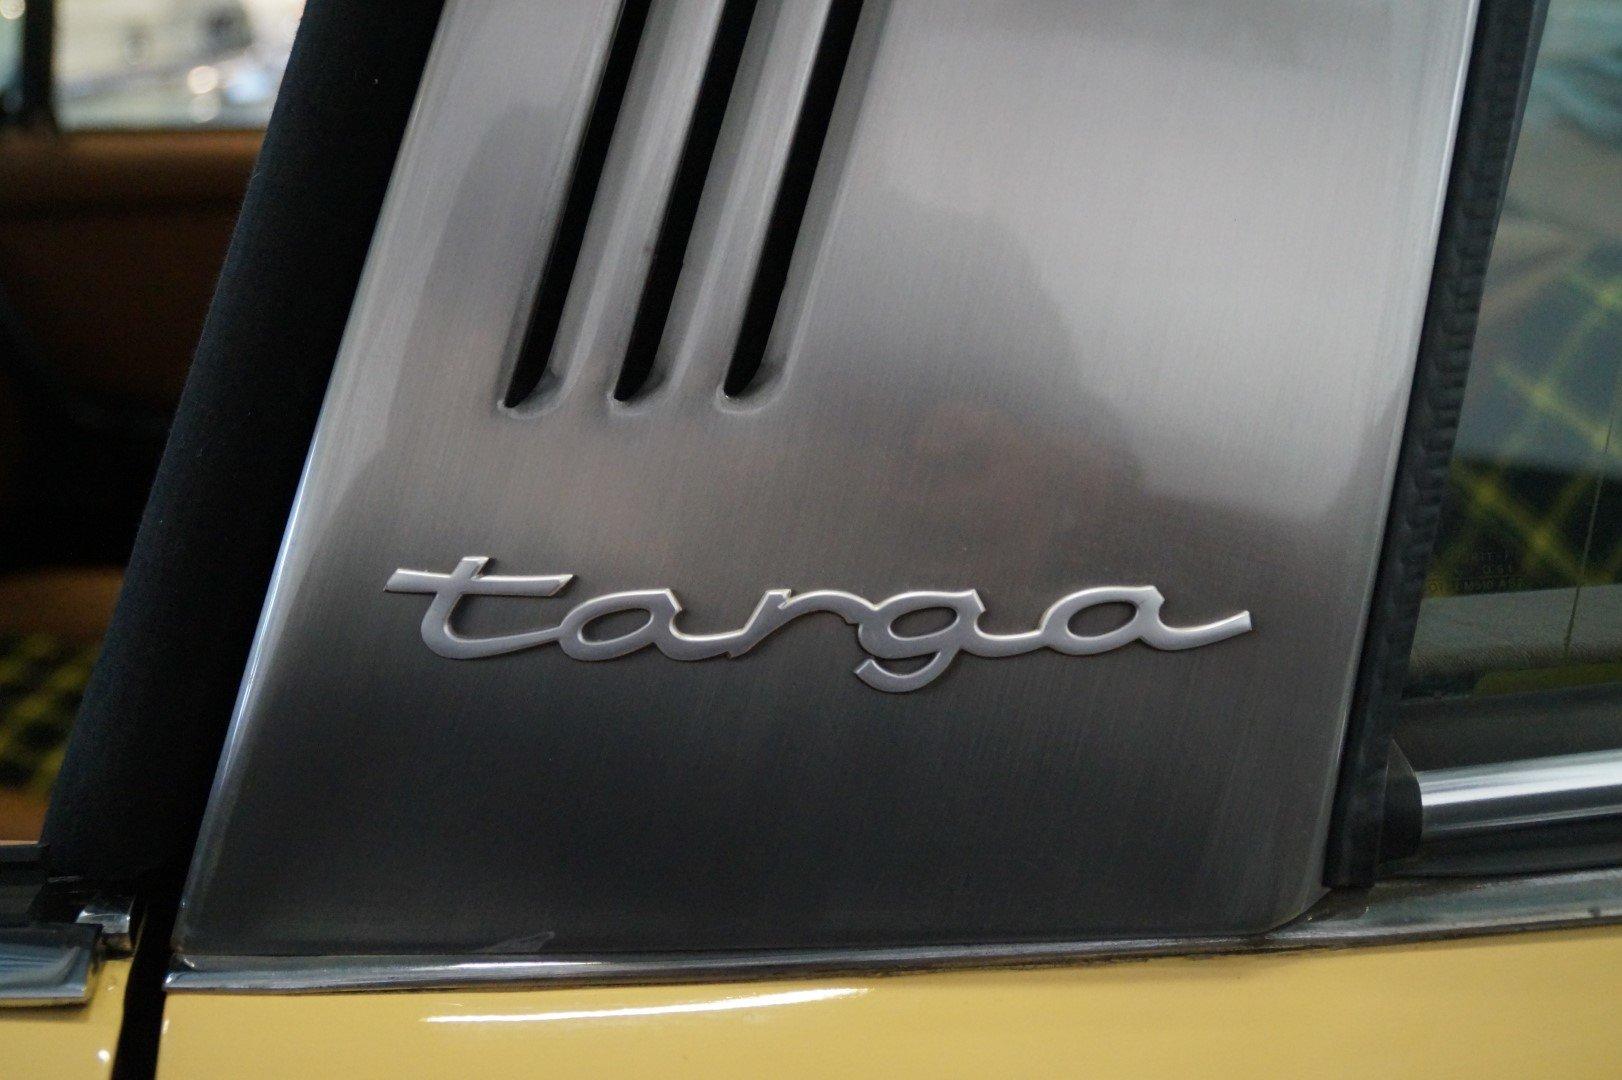 PORSCHE 911 911S 2.7 Targa Rare Colour Combination (1974) For Sale (picture 6 of 6)